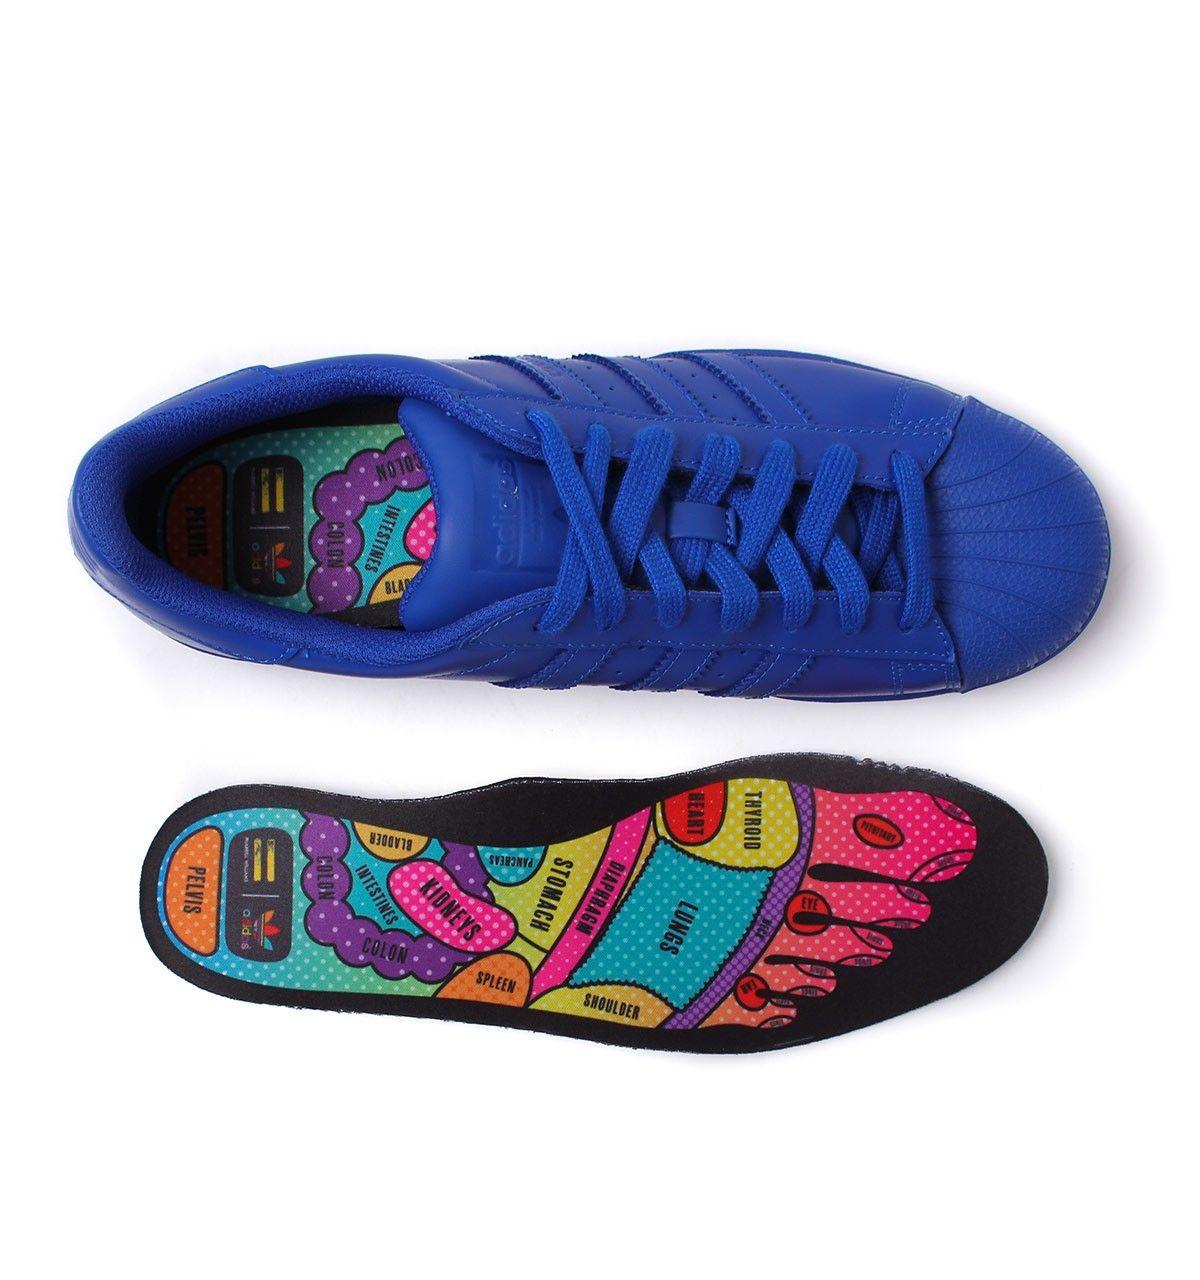 a1f7b42b2 Adidas Originals x Pharrell Williams Supercolor Bold Blue Superstar Trainers